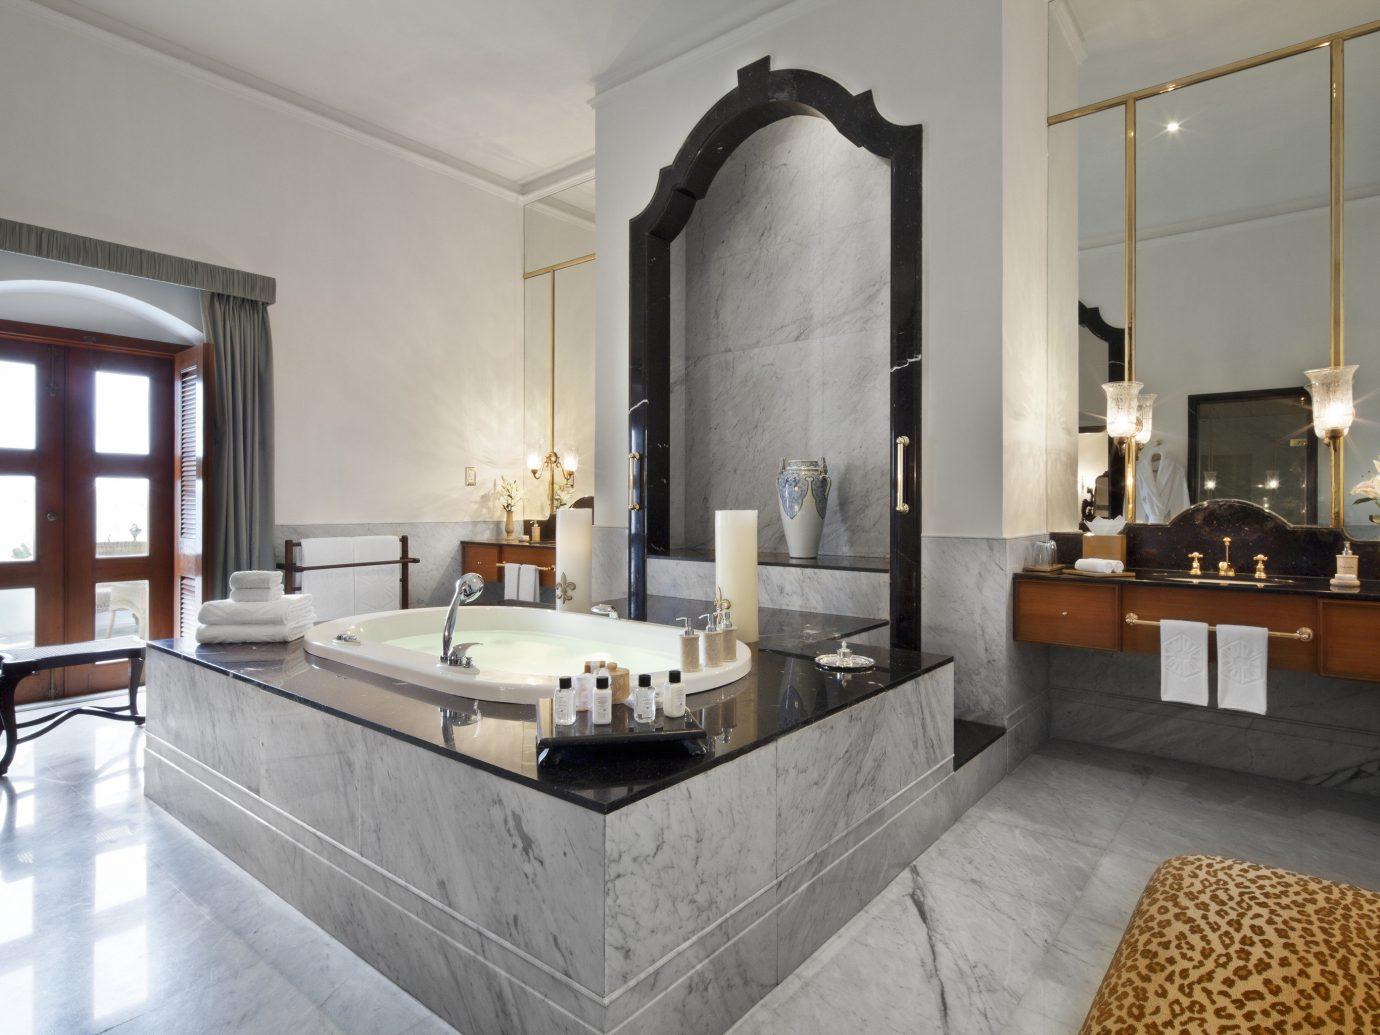 Hotels Luxury Travel indoor wall floor bathroom window room interior design sink estate Suite flooring interior designer